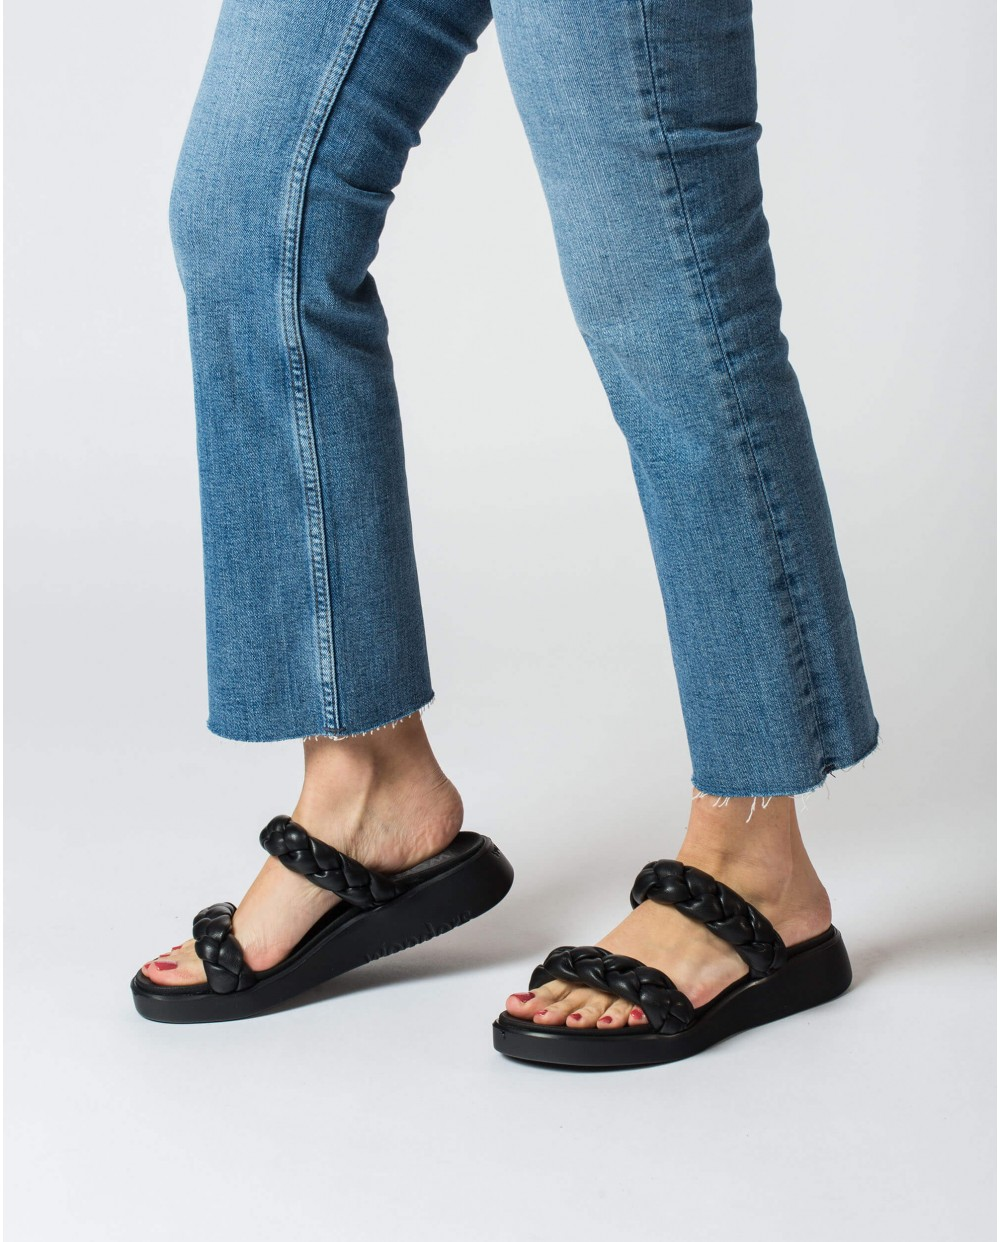 Wonders-Sandalias-sandalia trenzada acolchada